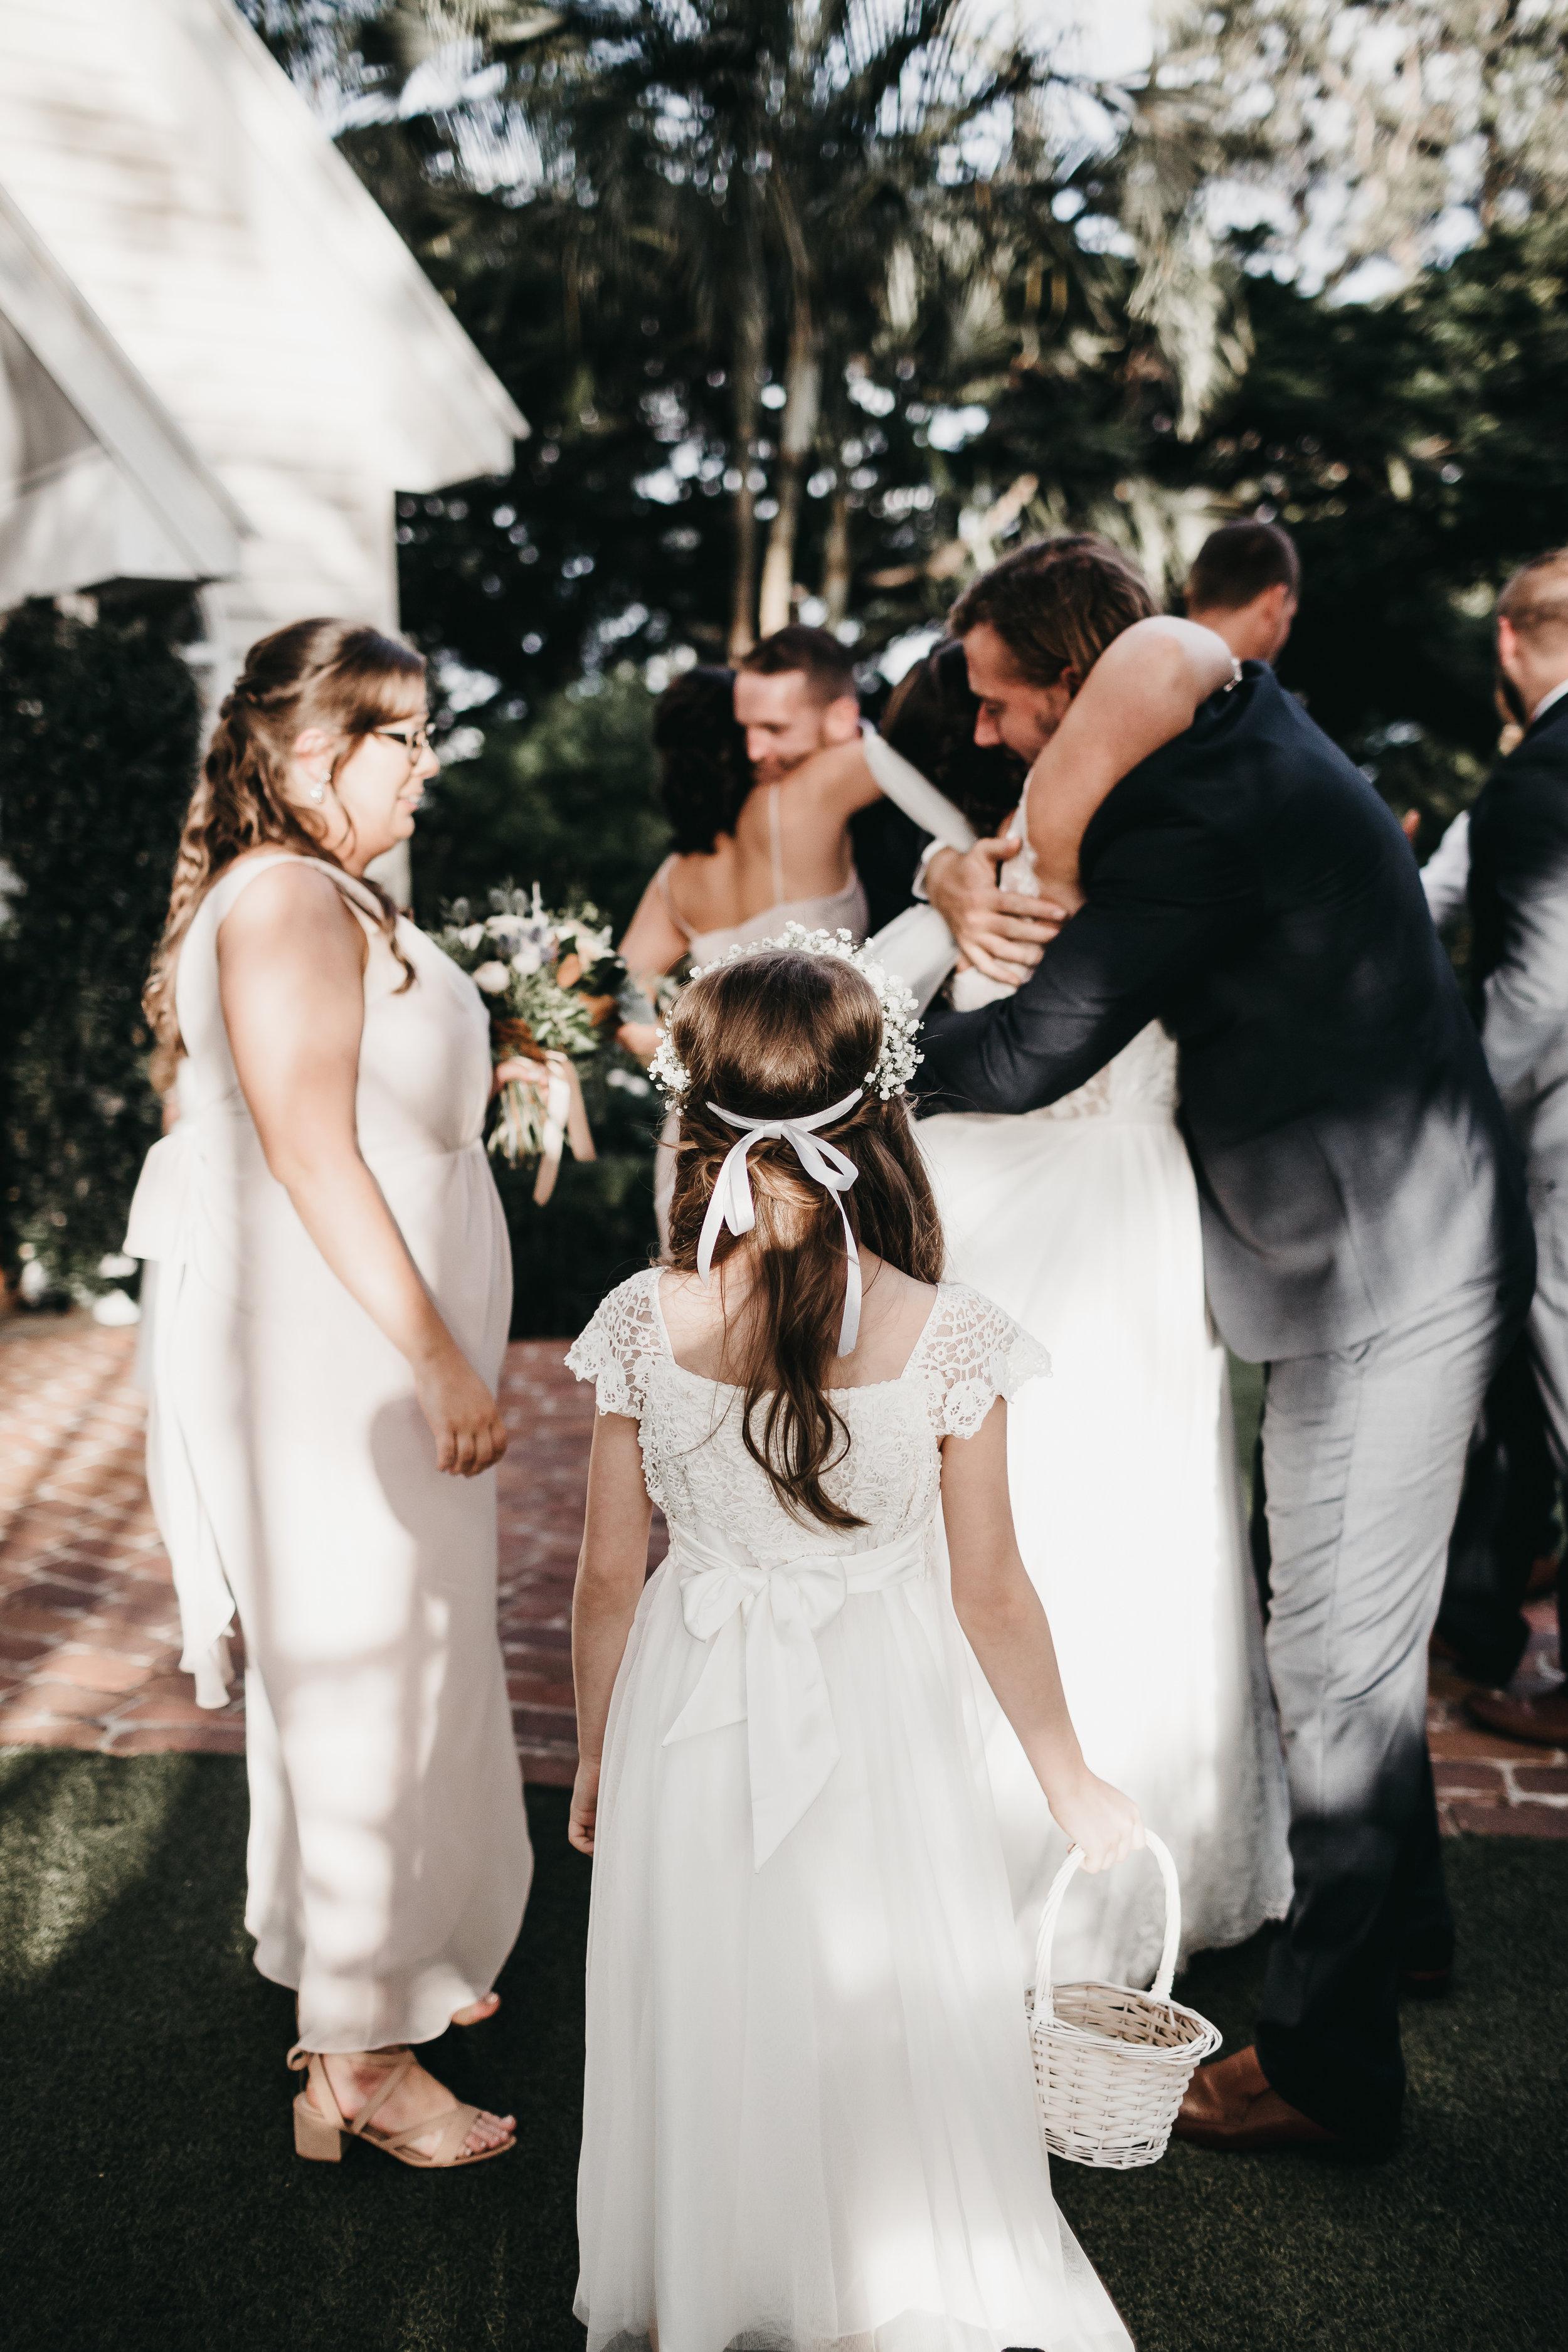 bondwedding-418.jpg